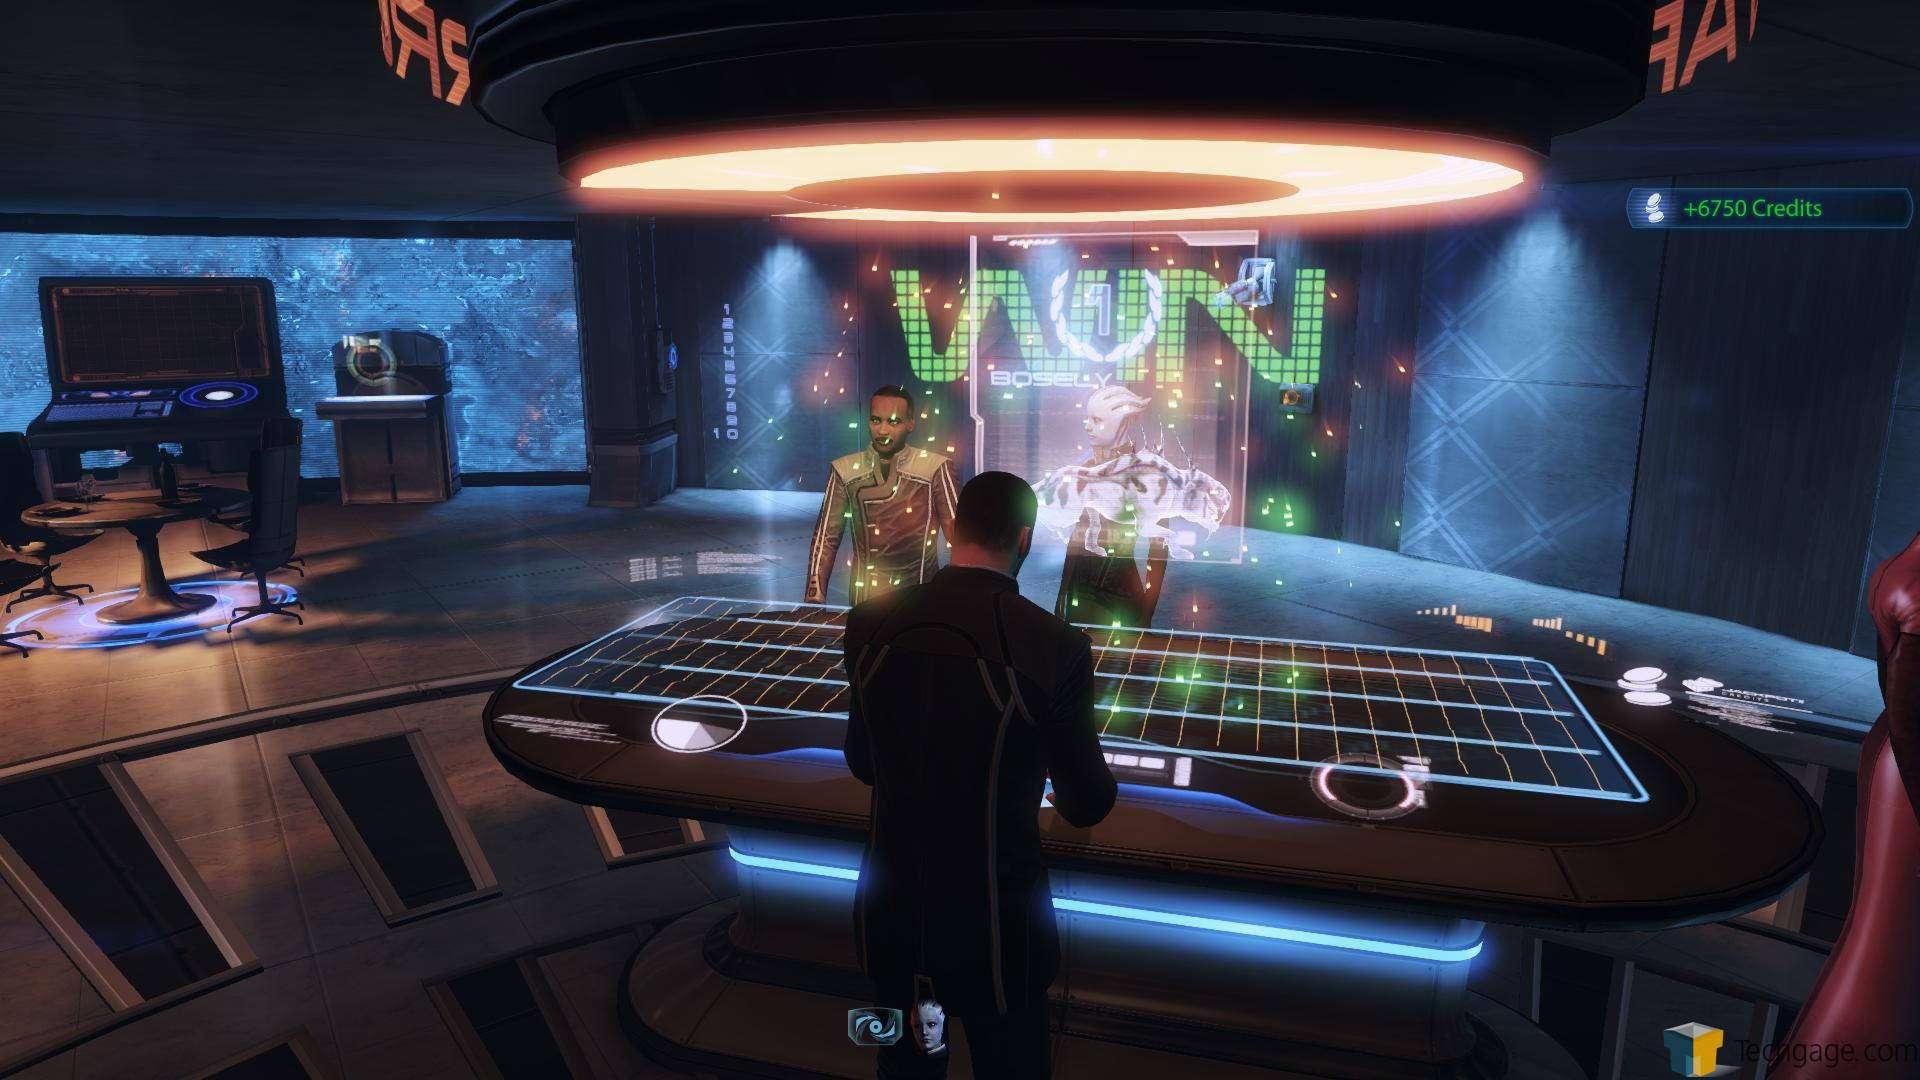 Techgage Image Mass Effect 3 Citadel Dlc